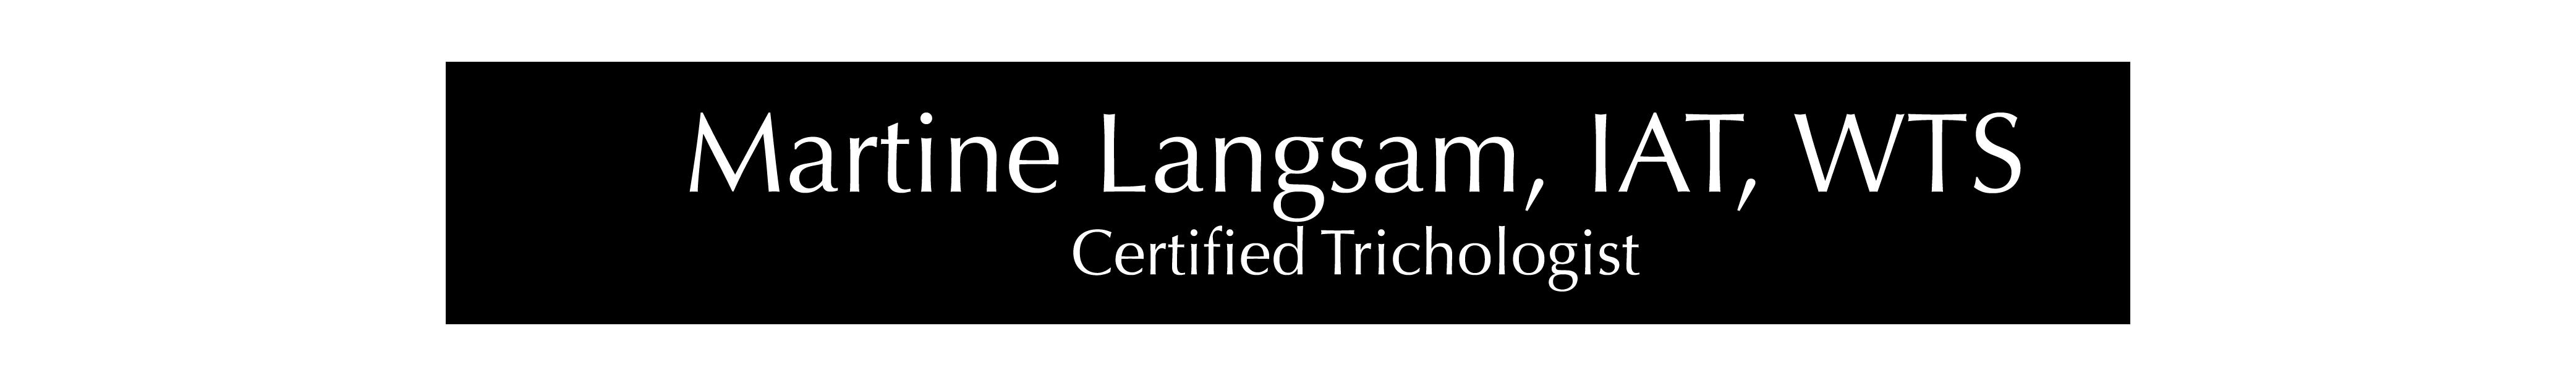 Martine Langsam, IAT Logo